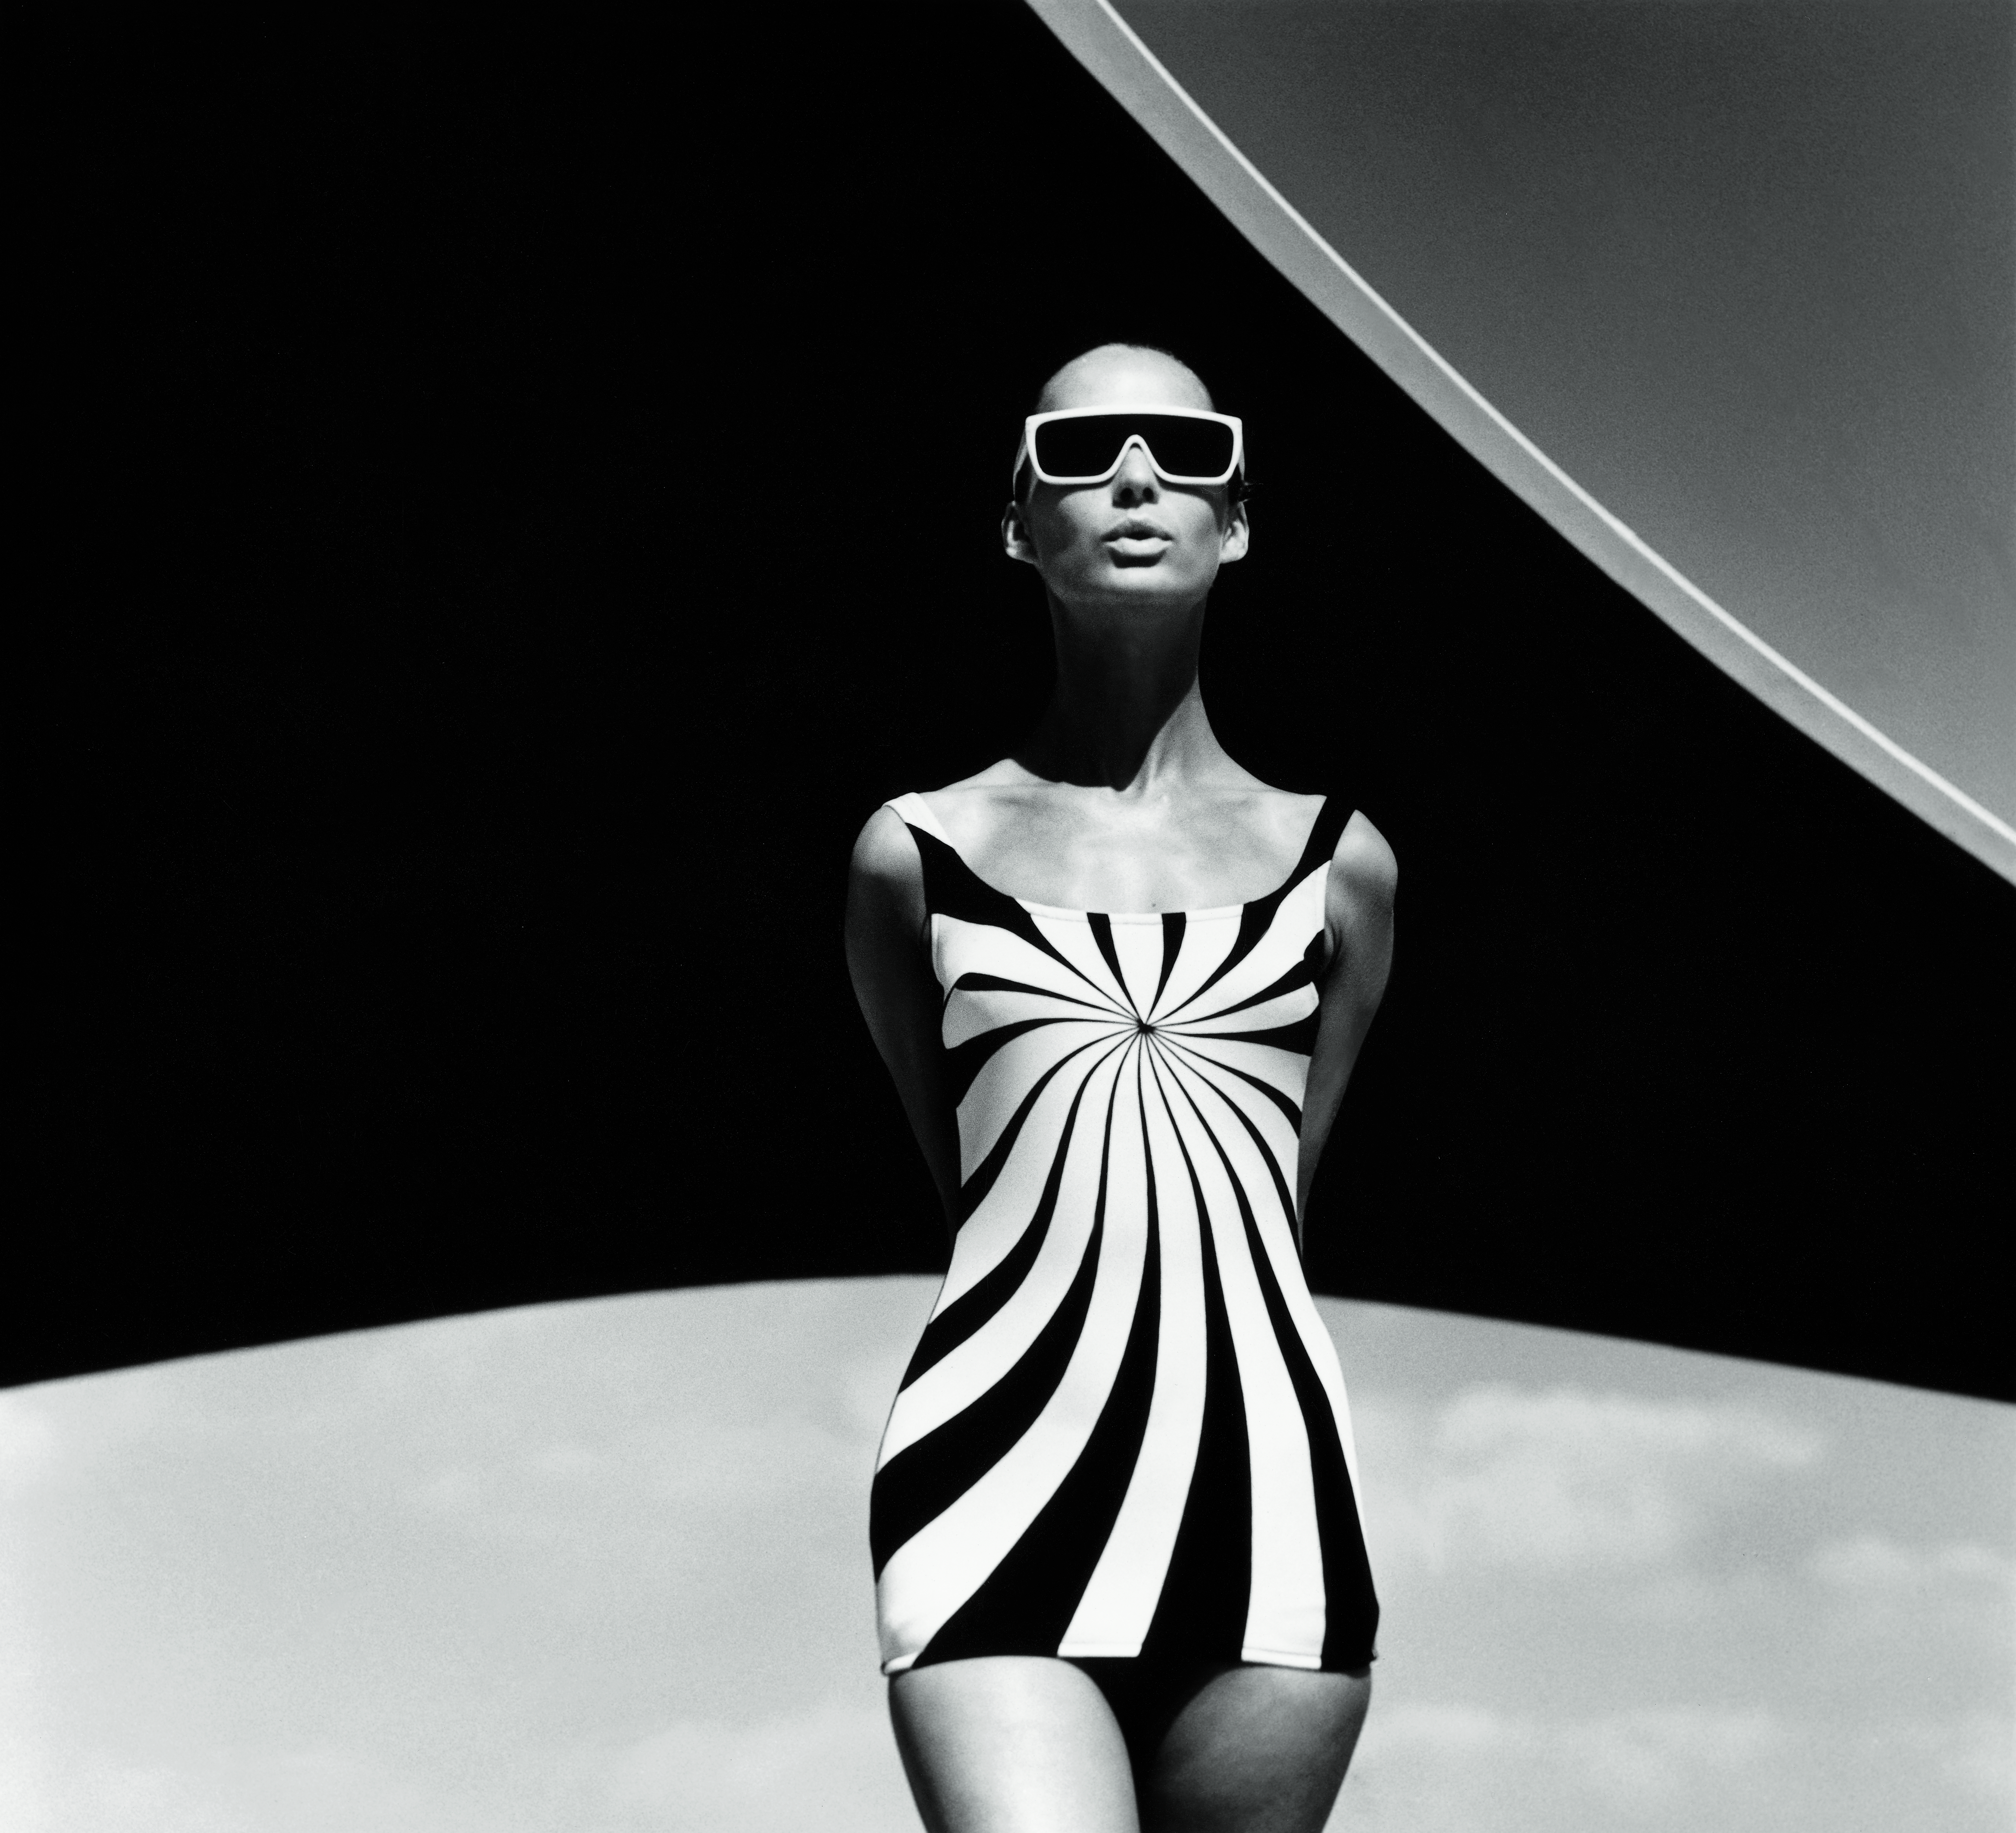 Brigitte Bauer Op Art bathing suit by Sinz F.C. Gundlach Vouliagmeni Greece 1966